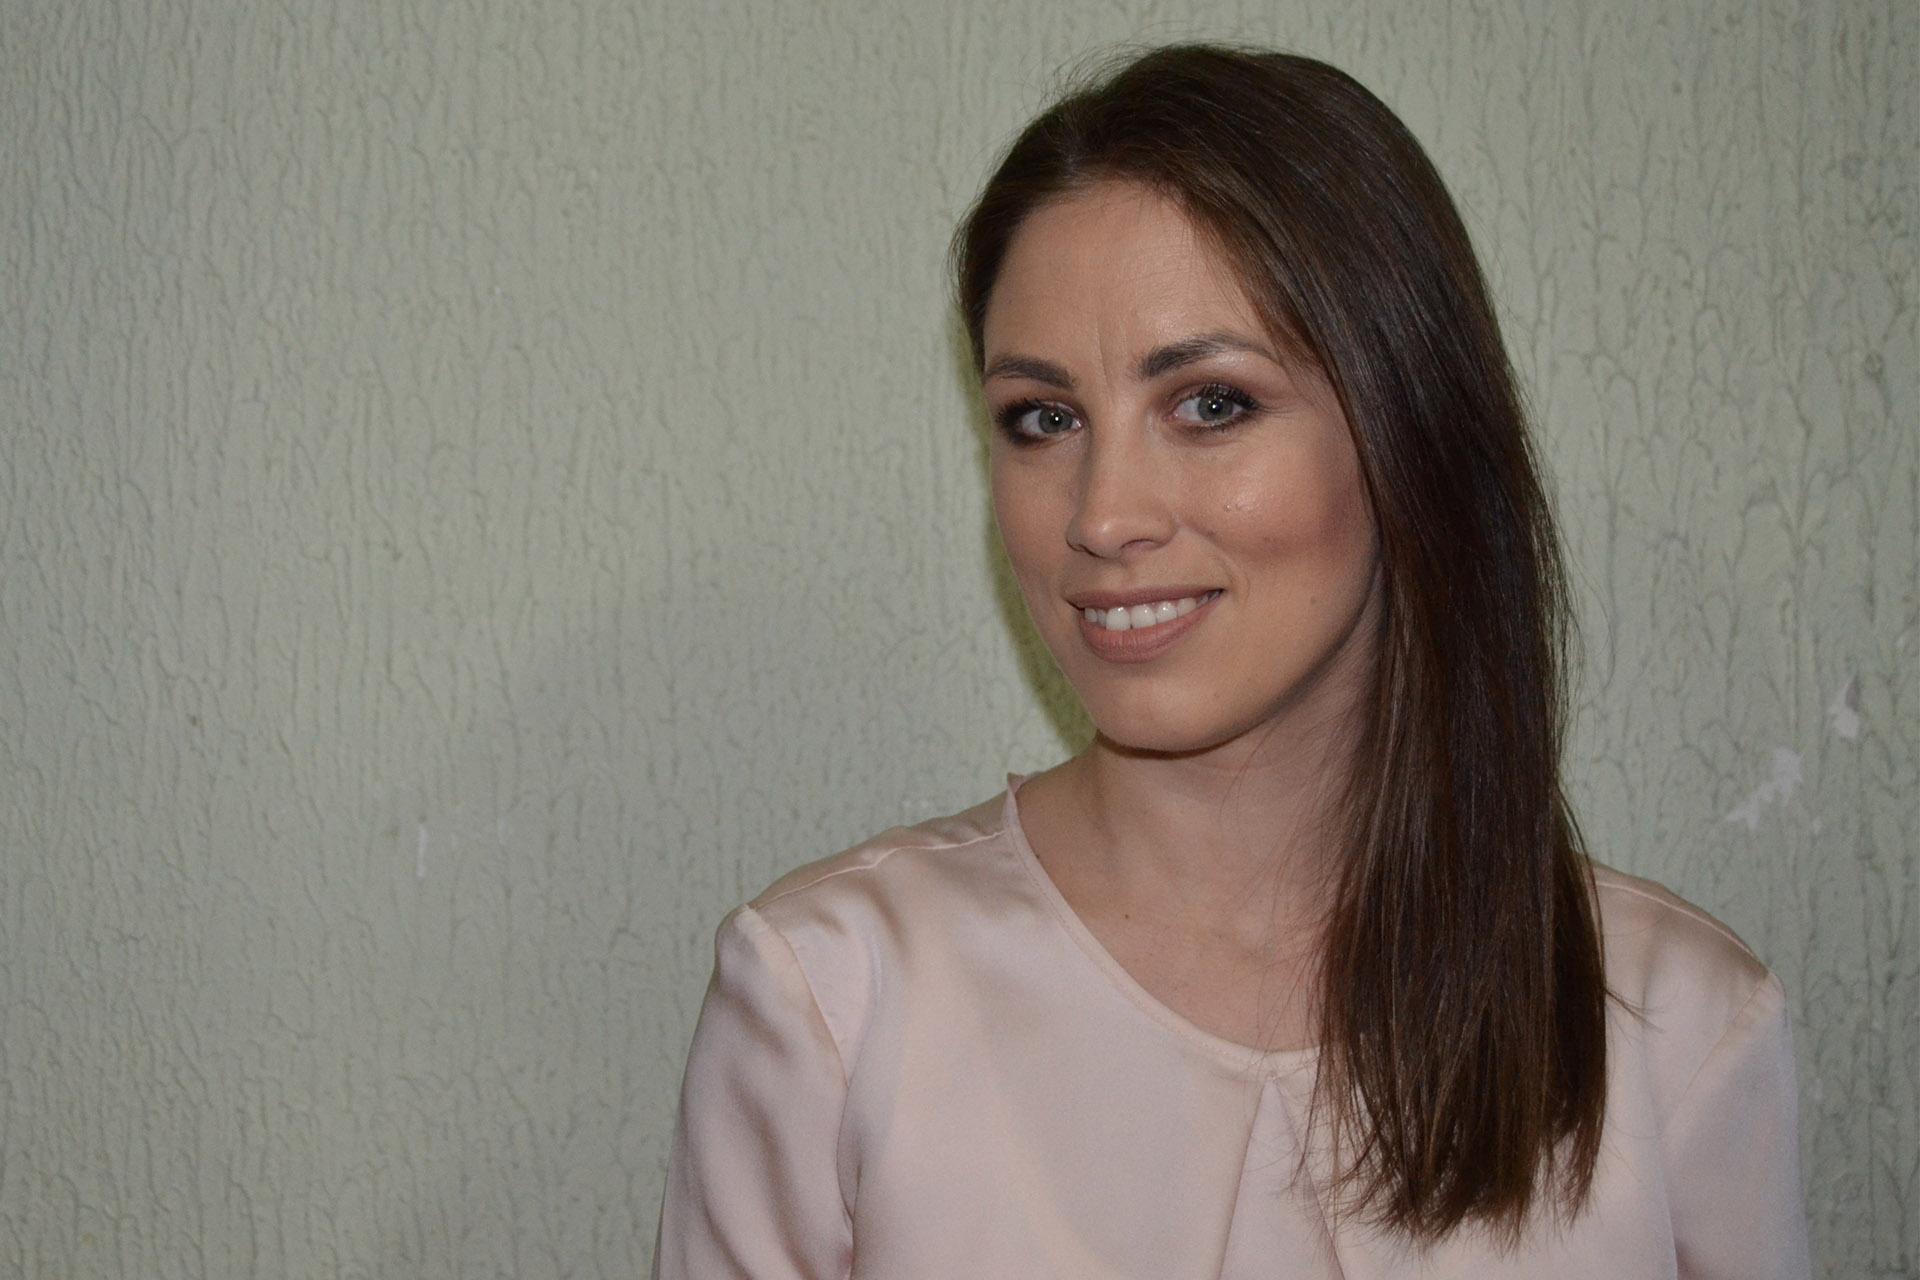 https://brankoradicevic.org.rs/wp-content/uploads/2019/04/Verica-Jerkovic-2.jpg